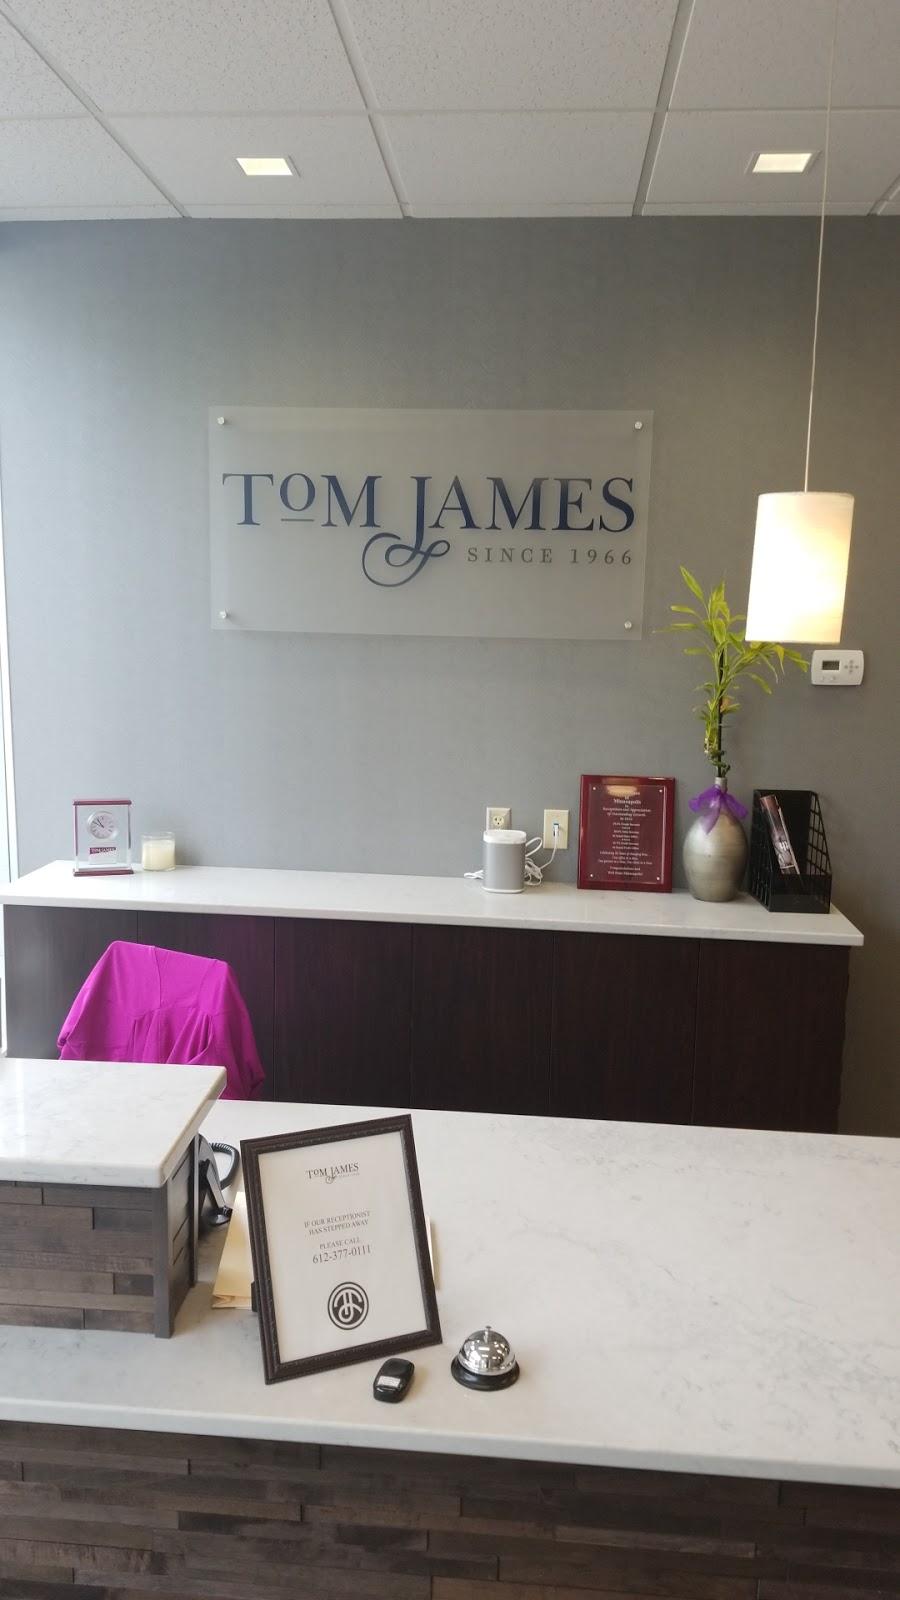 Tom James Company - clothing store    Photo 2 of 8   Address: 2523 S Wayzata Blvd Ste.#100, Minneapolis, MN 55405, USA   Phone: (612) 377-0111